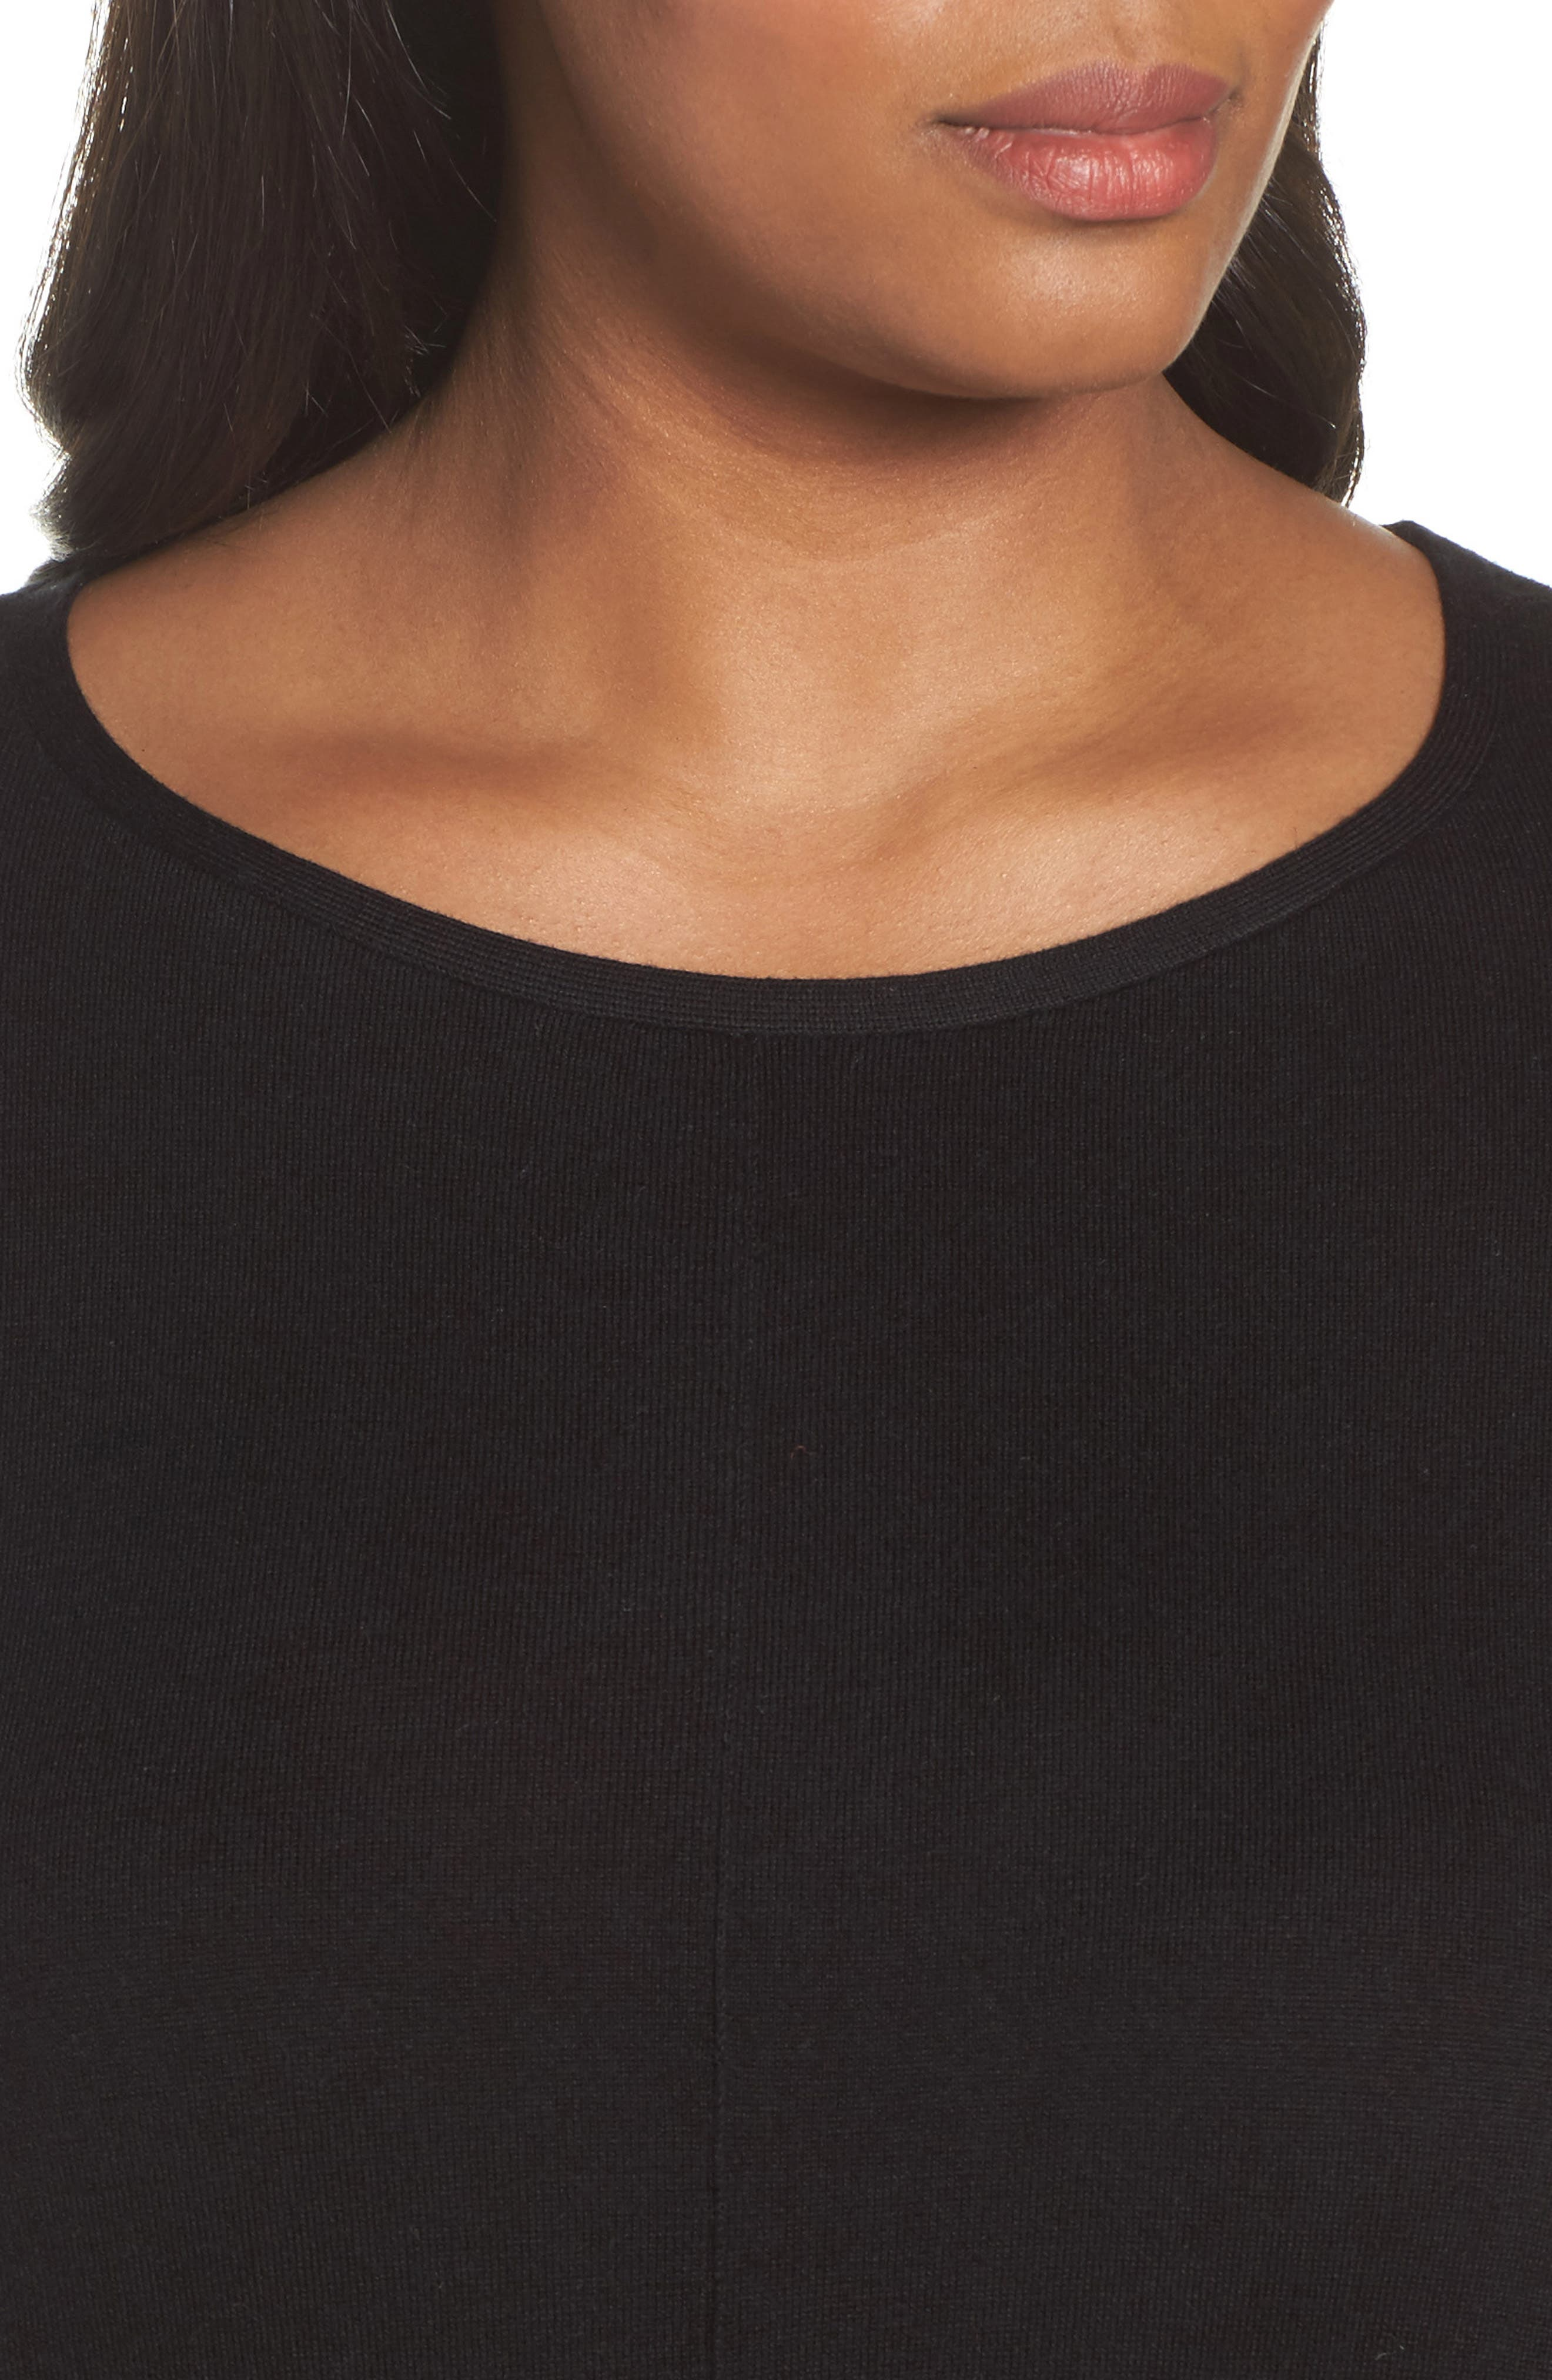 Dolman Sleeve Sweater,                             Alternate thumbnail 4, color,                             001